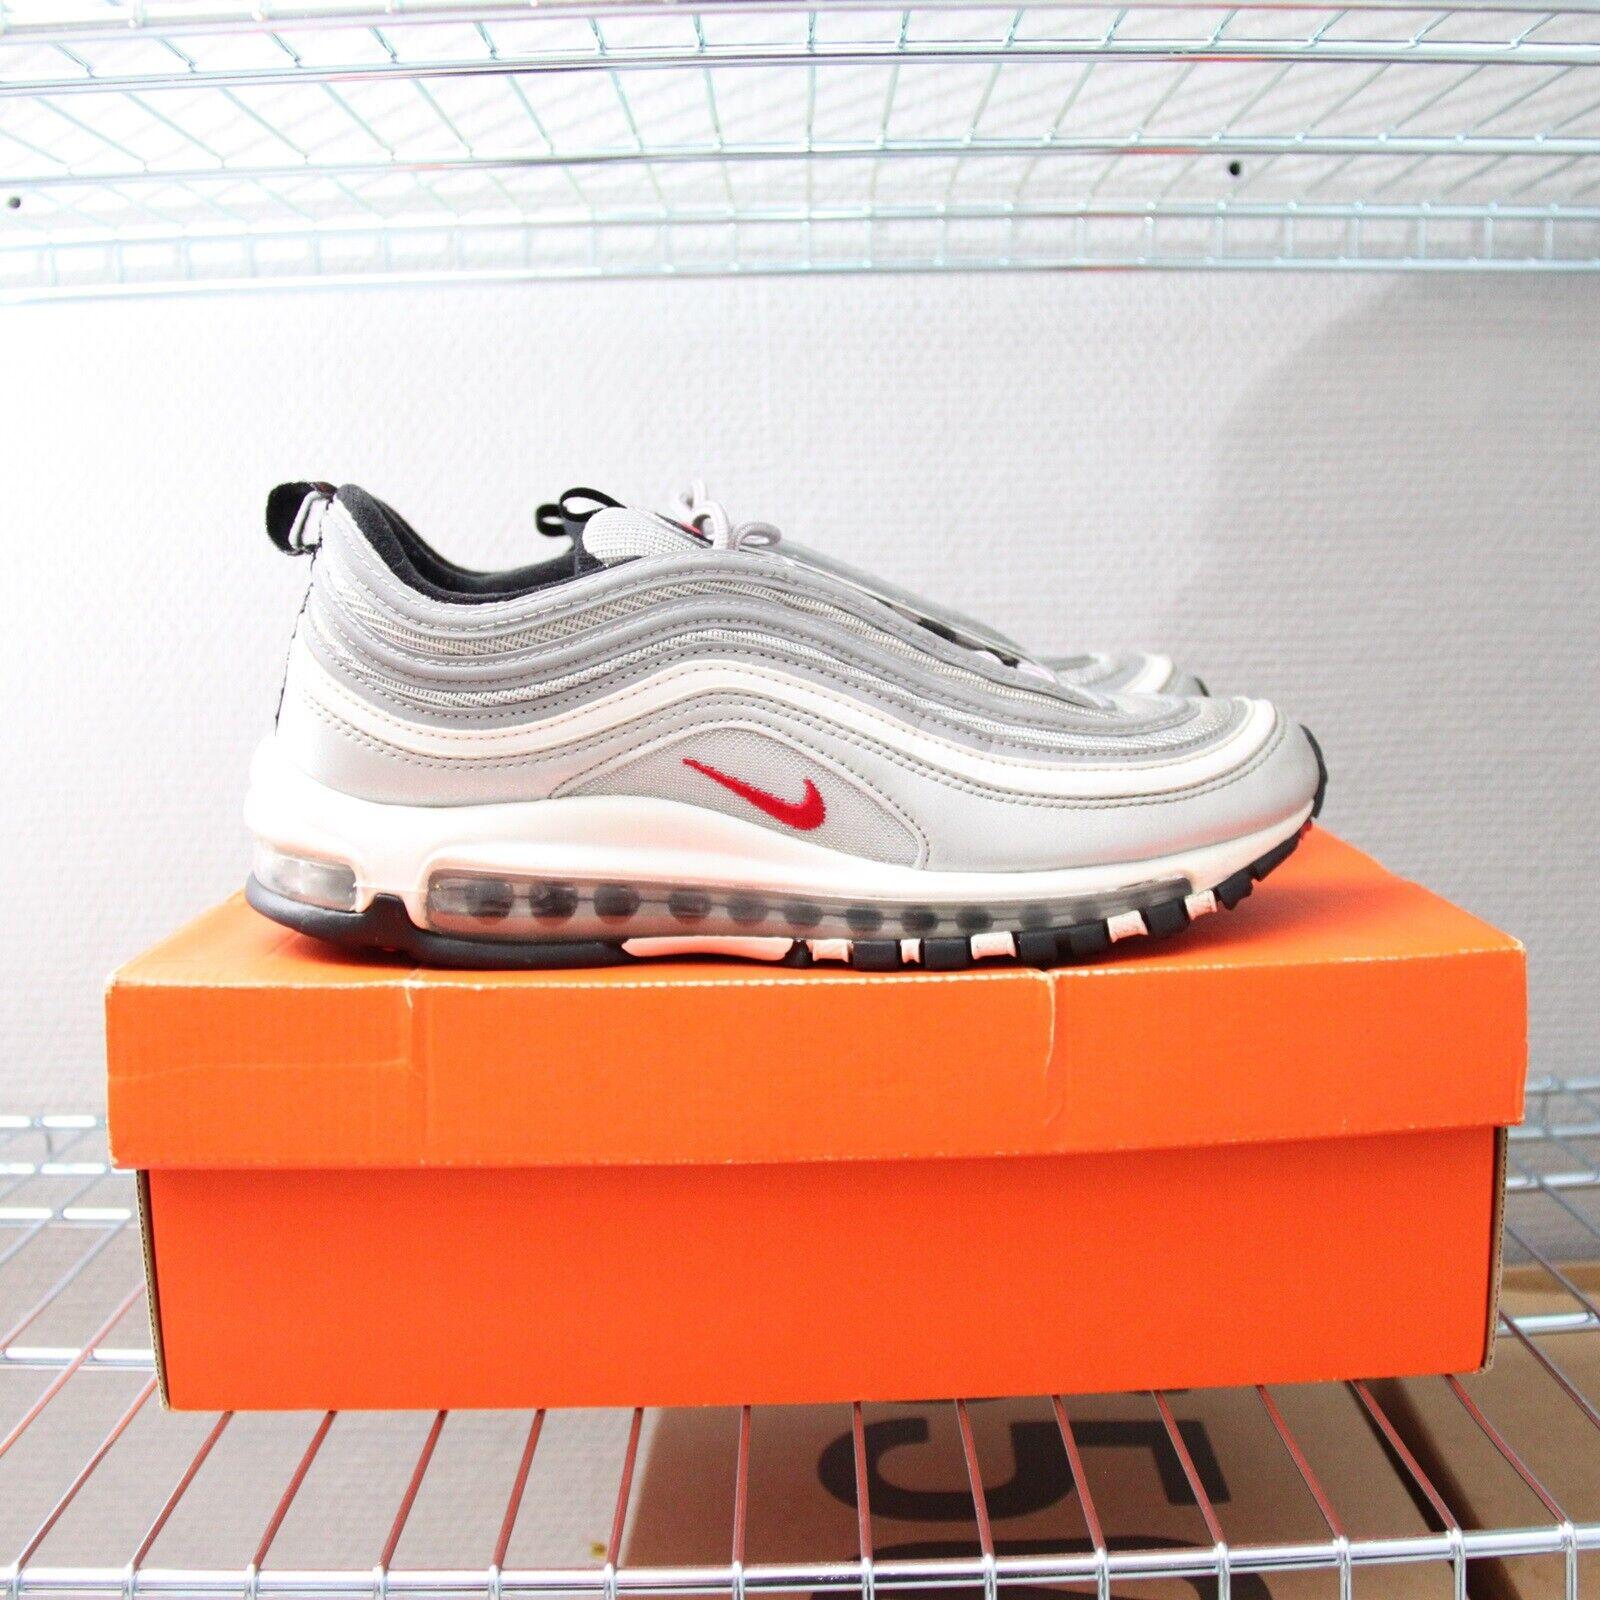 Andet, Nike Air Max 97 Silver Bullet, str. 46, God men